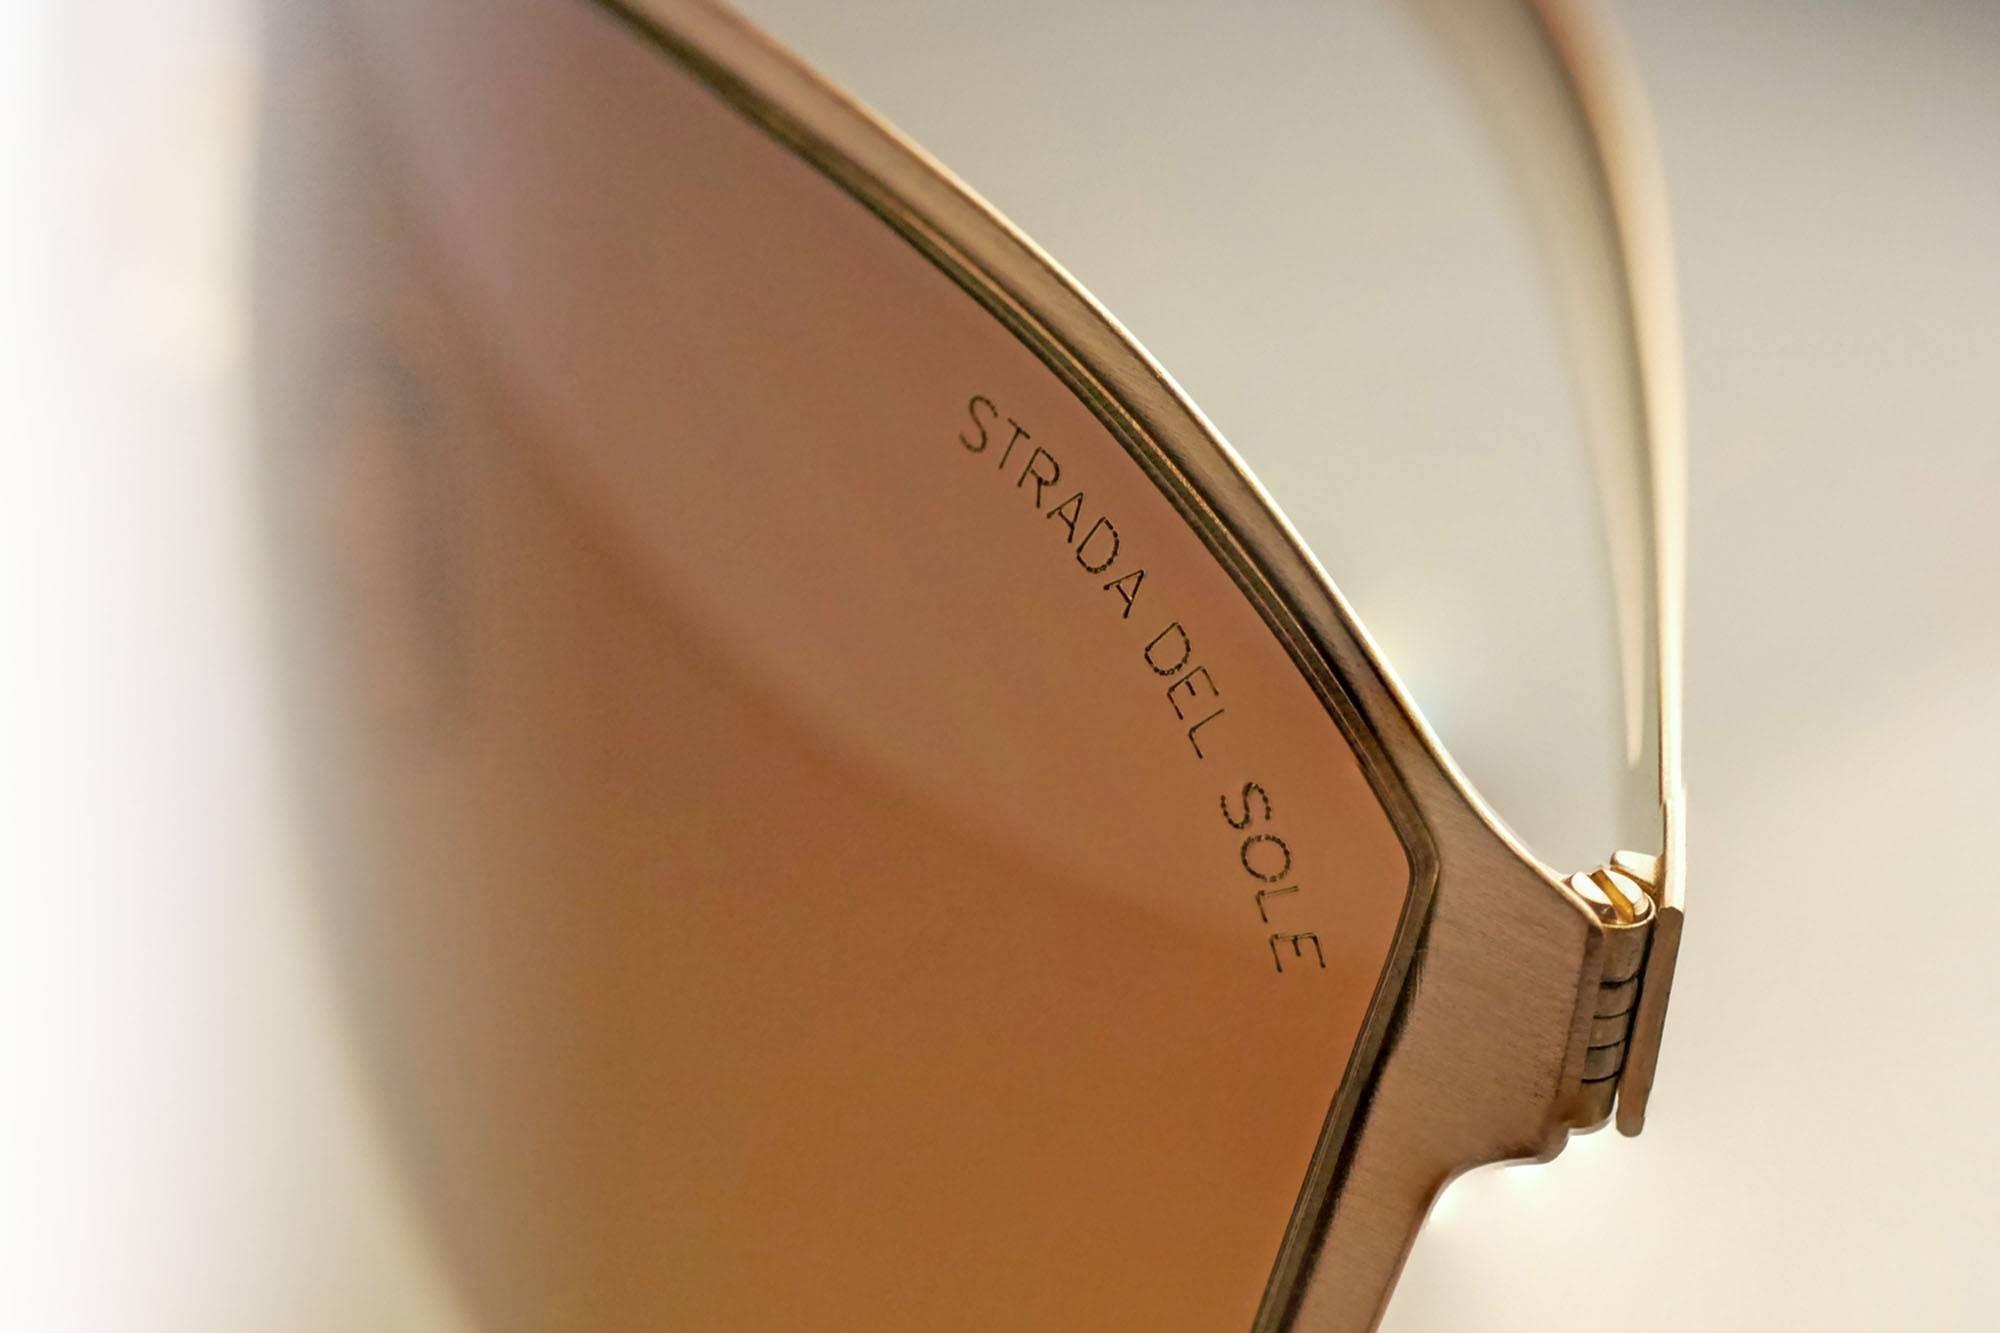 Strada del Sole Sonnenbrillen